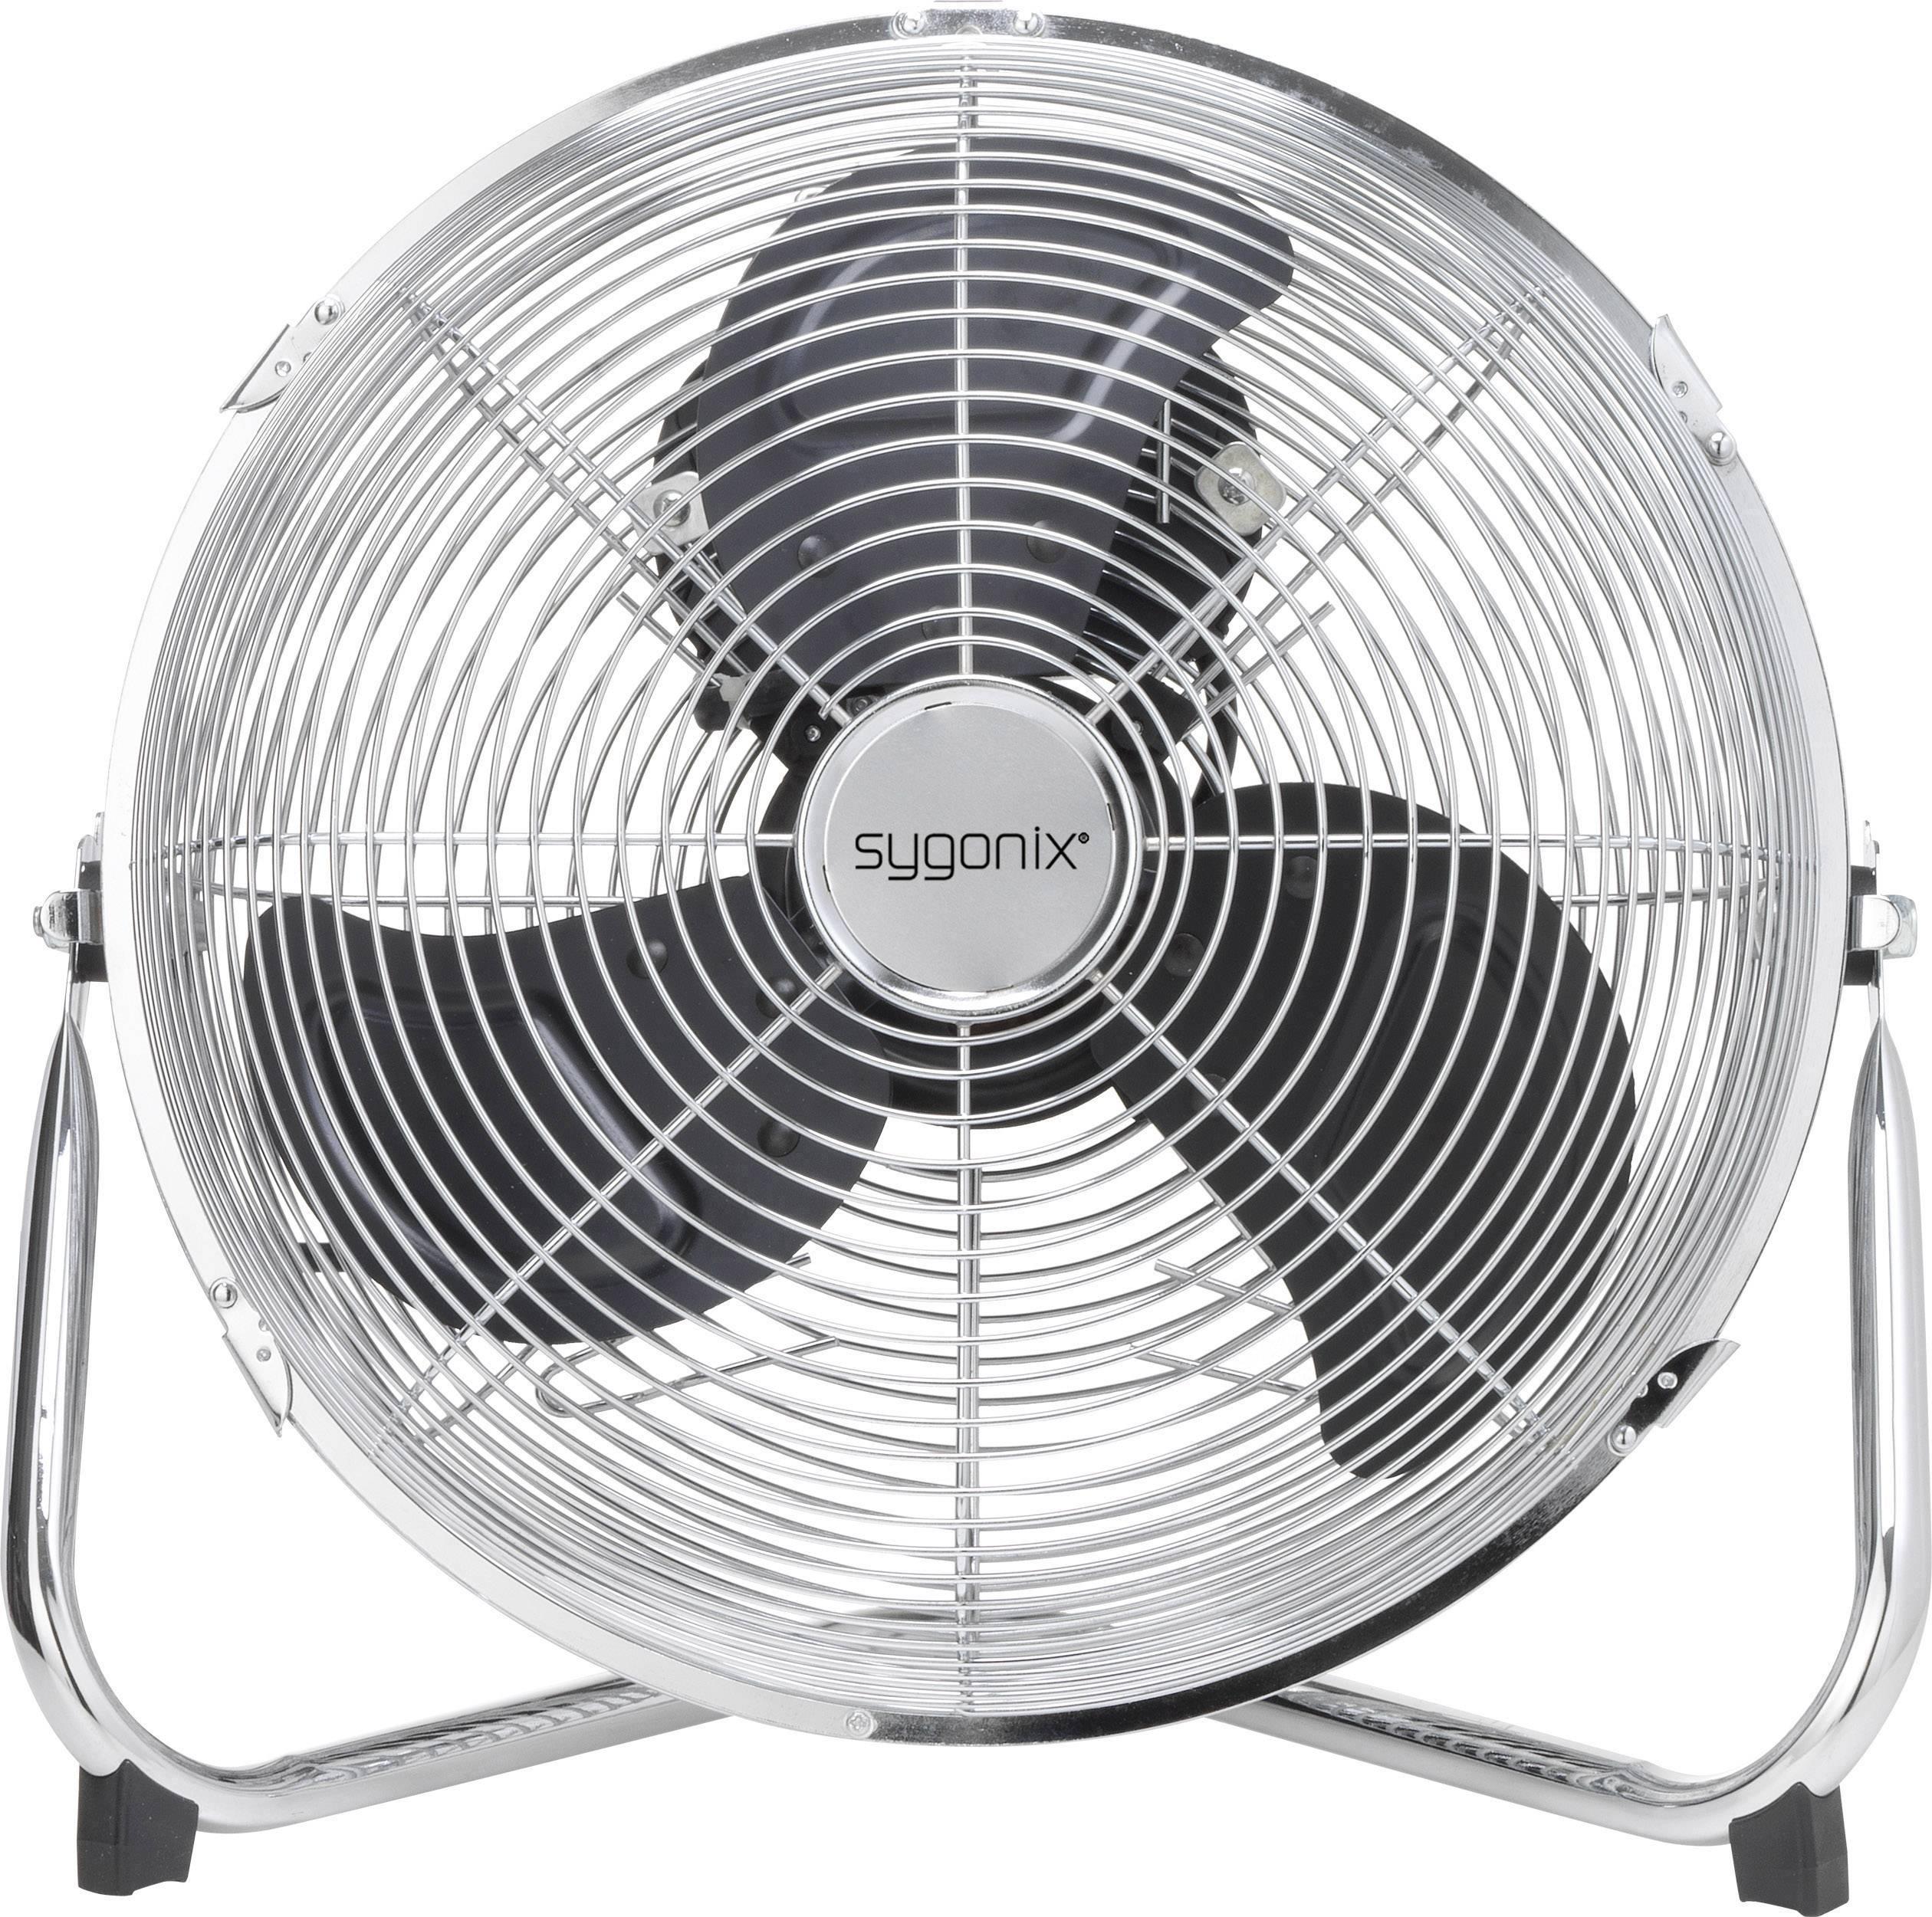 Podlahový ventilátor Sygonix FE-30, 55 W, stříbrná